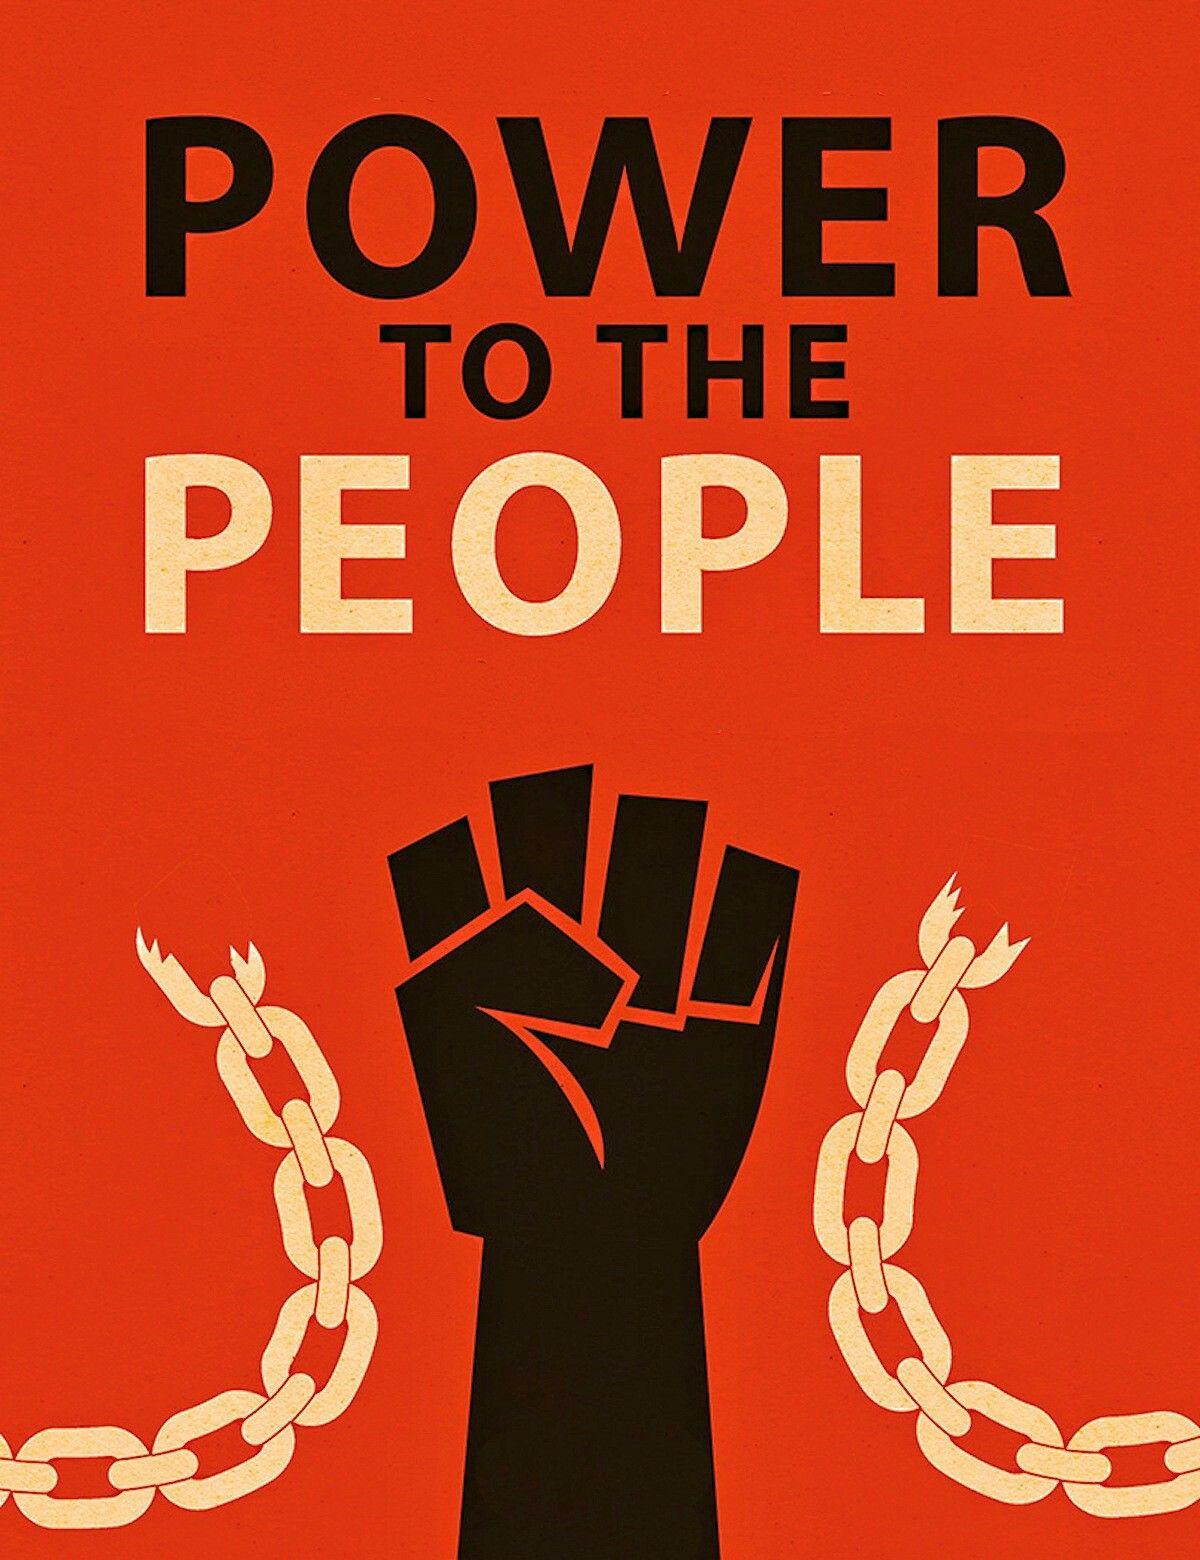 Pin By Nate Ranostay On Democratic Eco Socialist Revolution Black